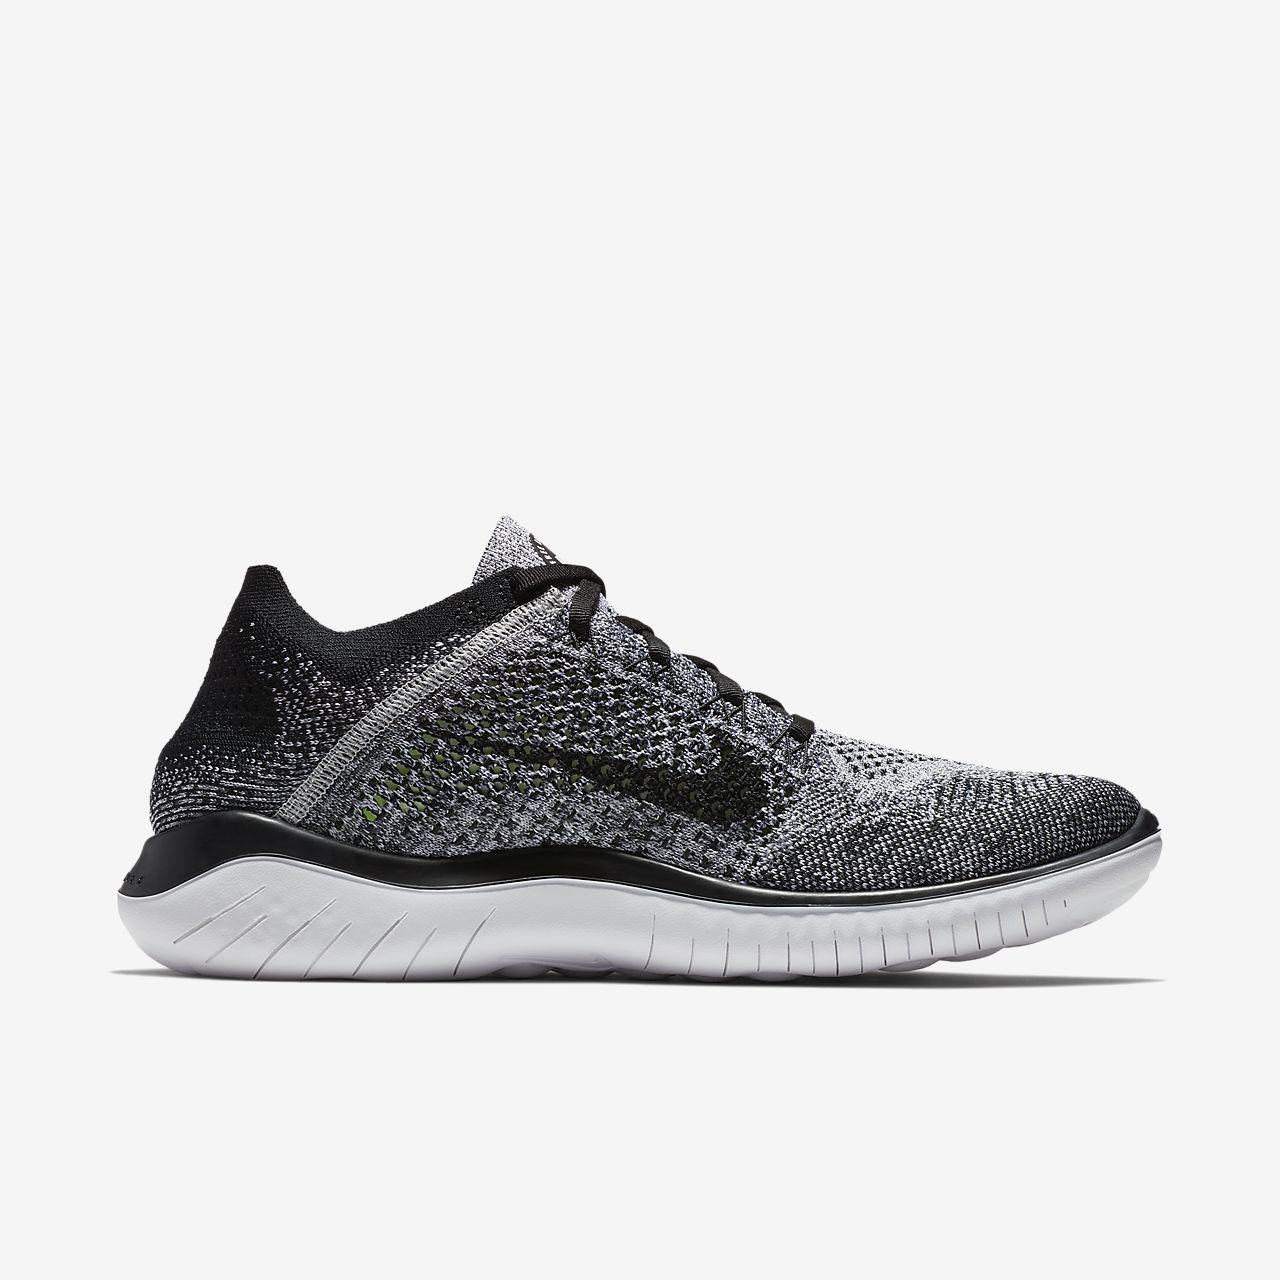 Nike Libre Rn Flyknit 2018 - Chaussures Pour Les Hommes / Noir Nike 82XvOMJRd